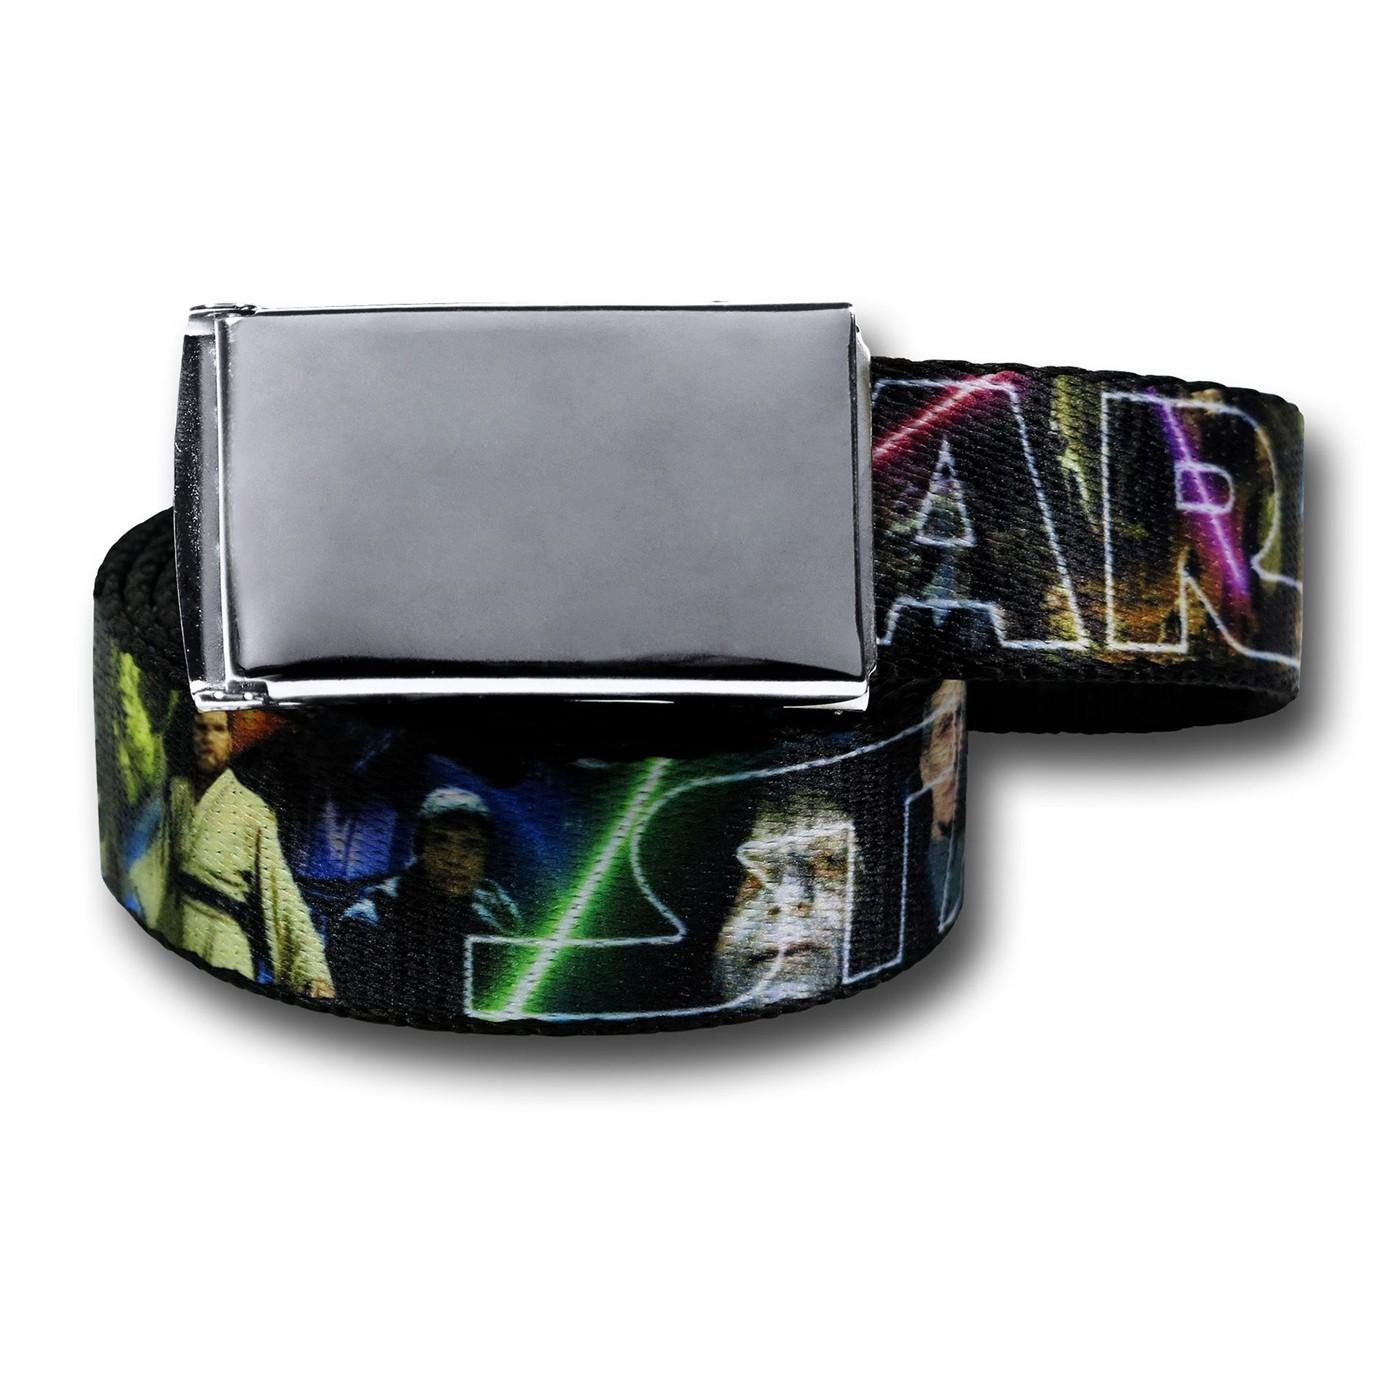 Star Wars Movie Scenes Web Belt